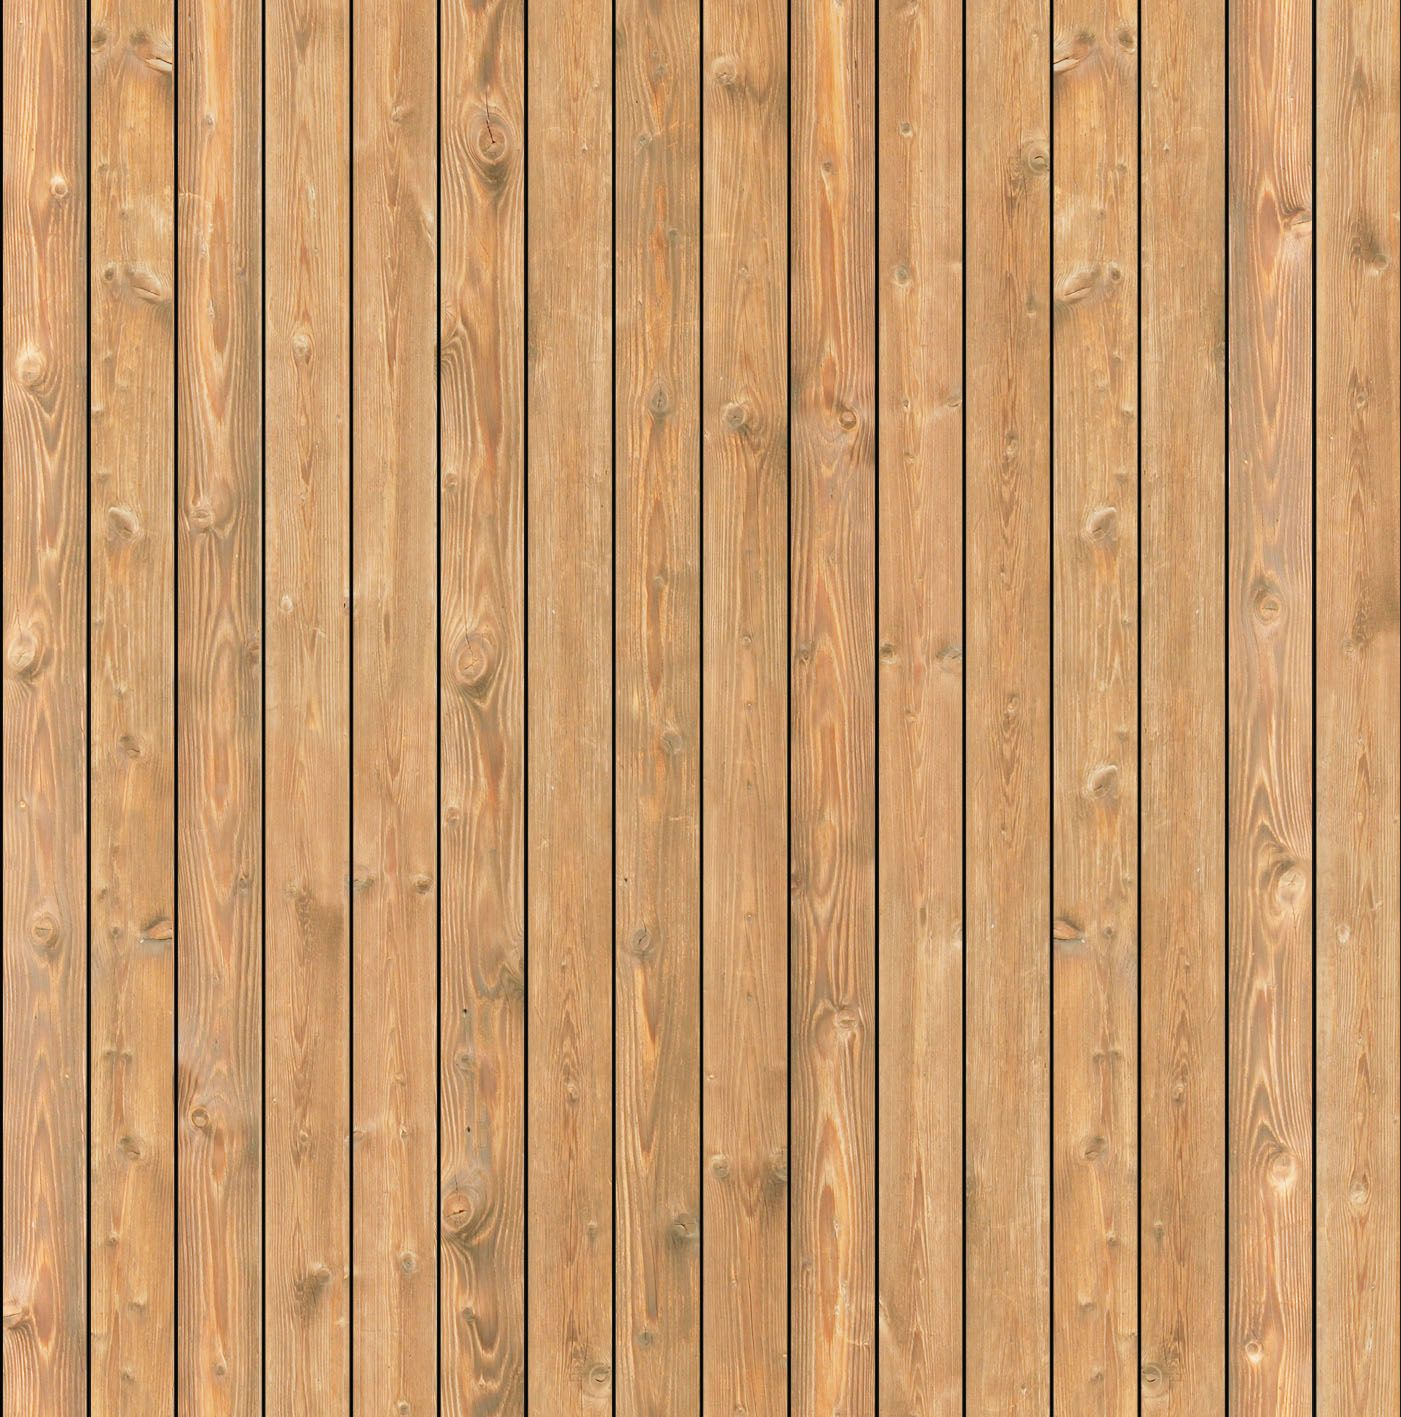 Texture seamless wood texture wood pinterest woods for Wood floor texture seamless